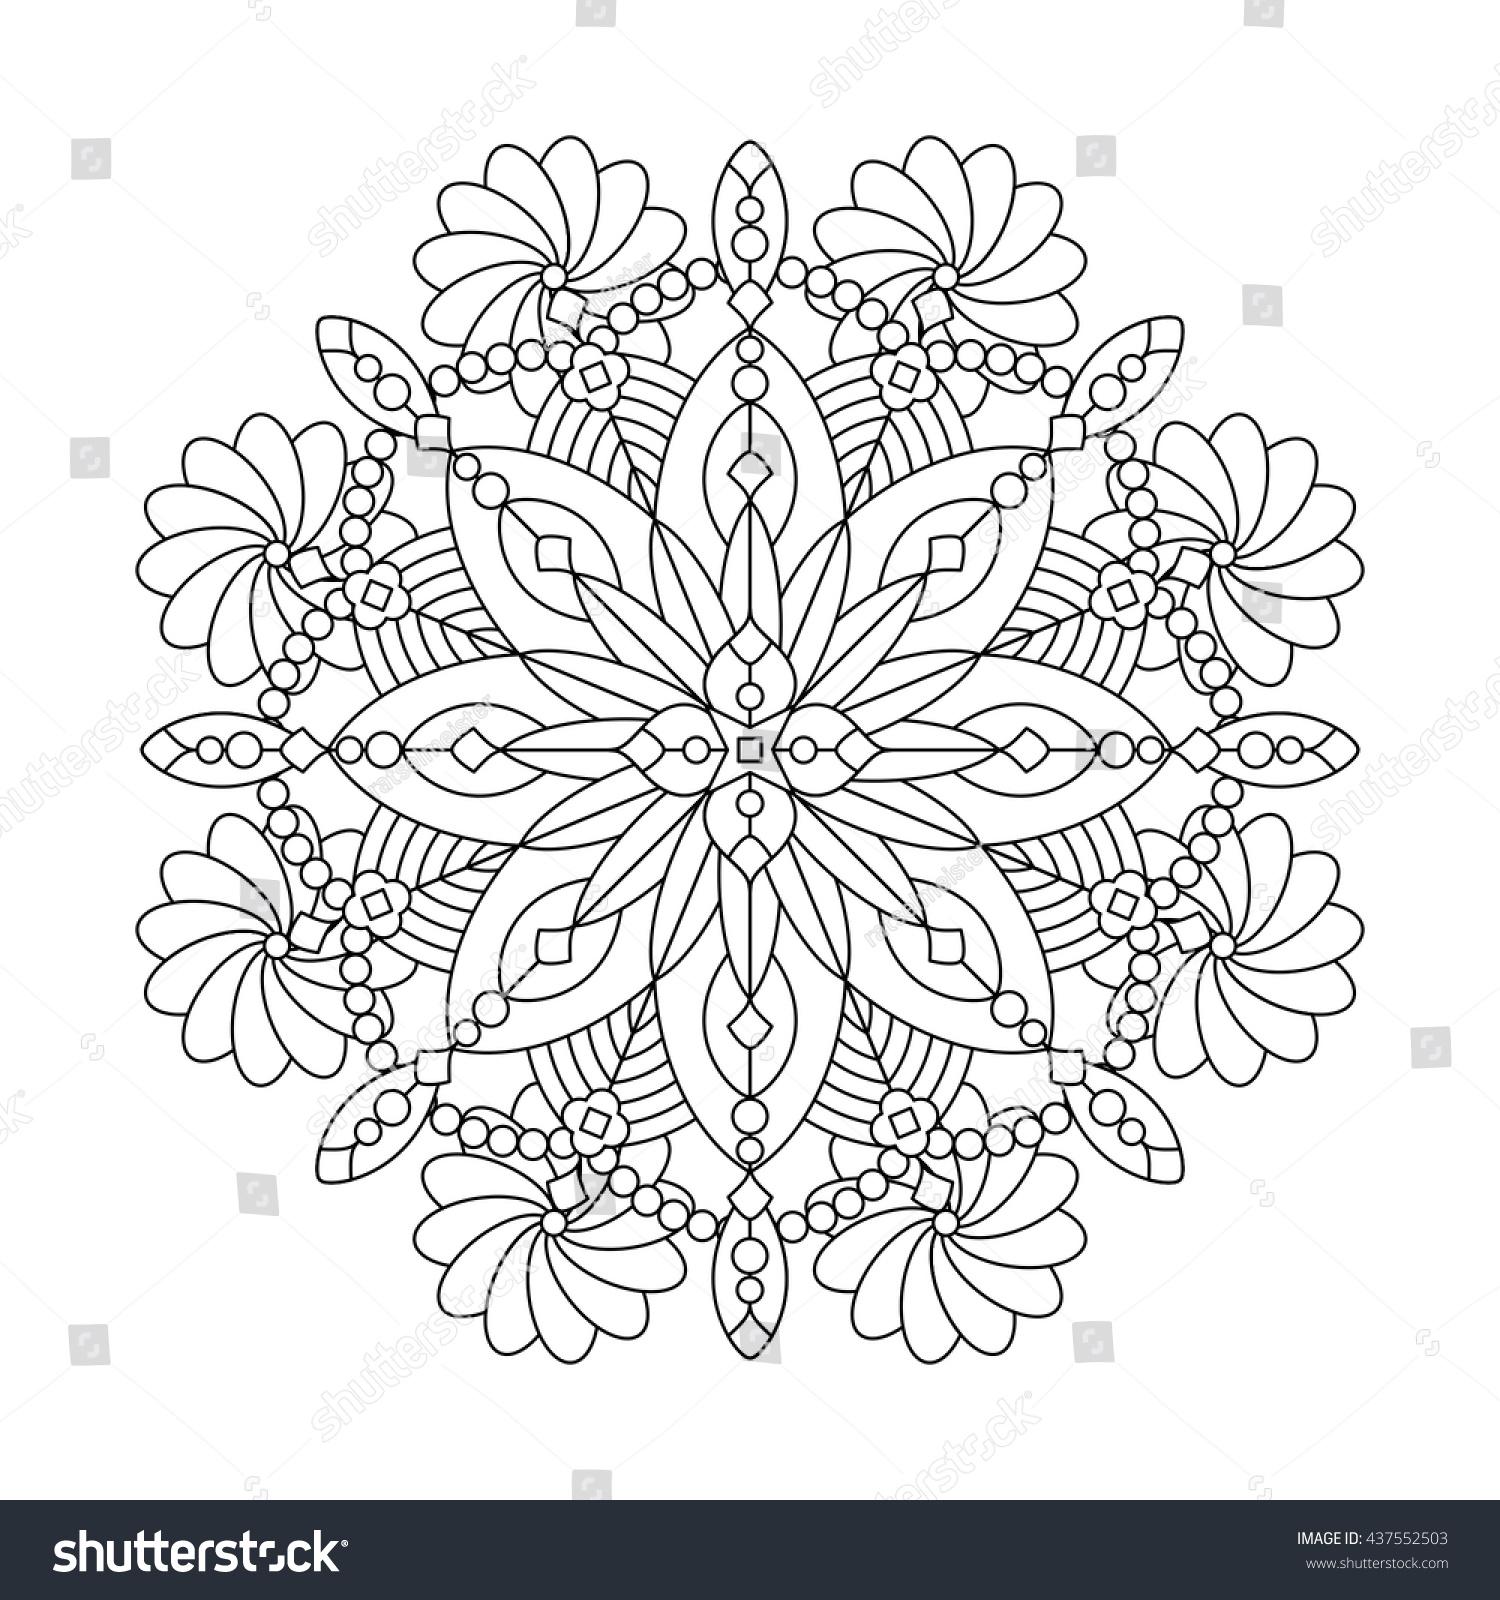 abstract mandala whimsical snowflake line art stock vector